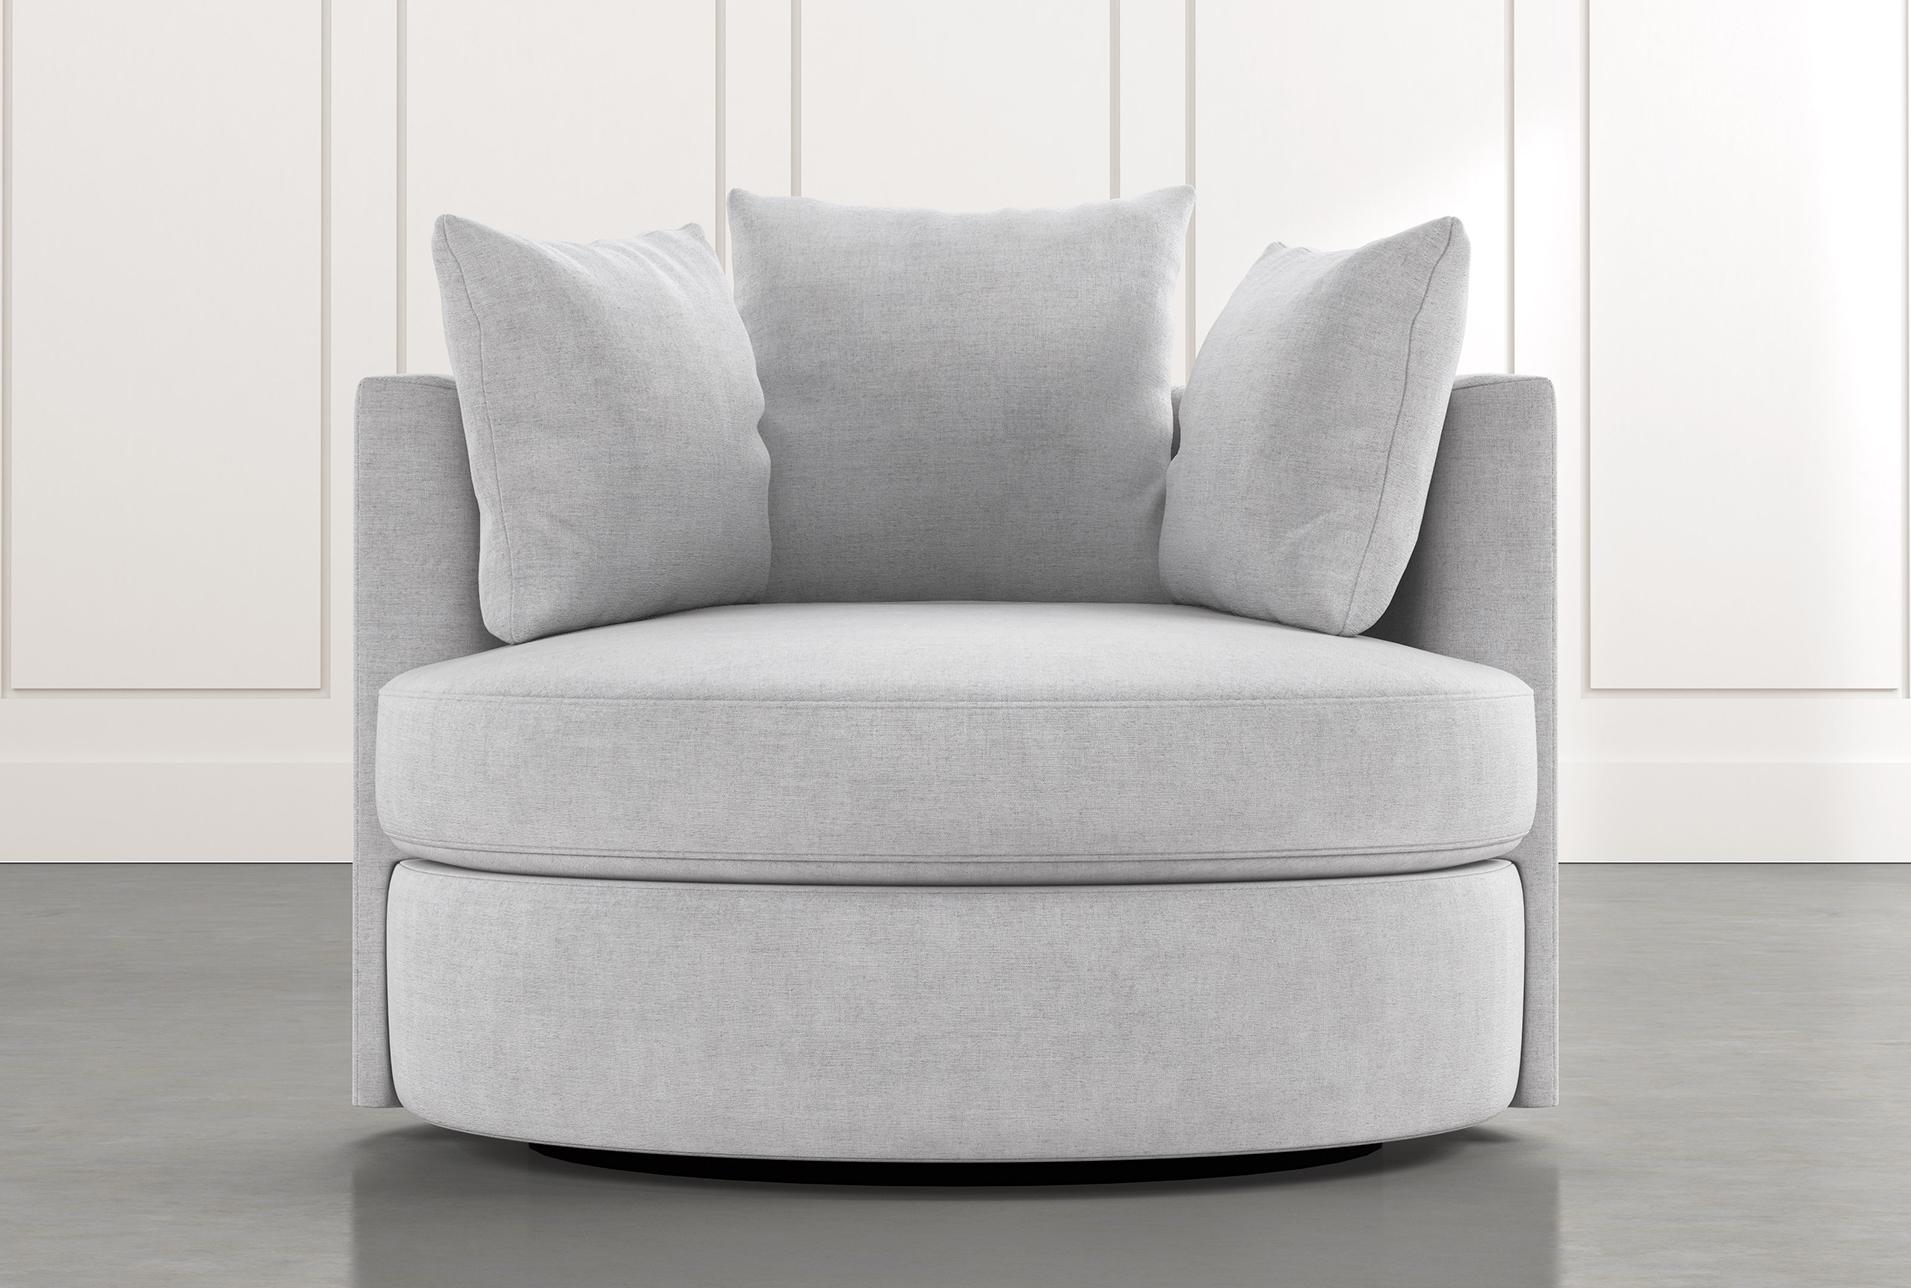 Gibson Ii Light Grey Swivel Cuddler In 2021 Living Room Chairs Comfy Sitting Room Decor Swivel Chair Living Room